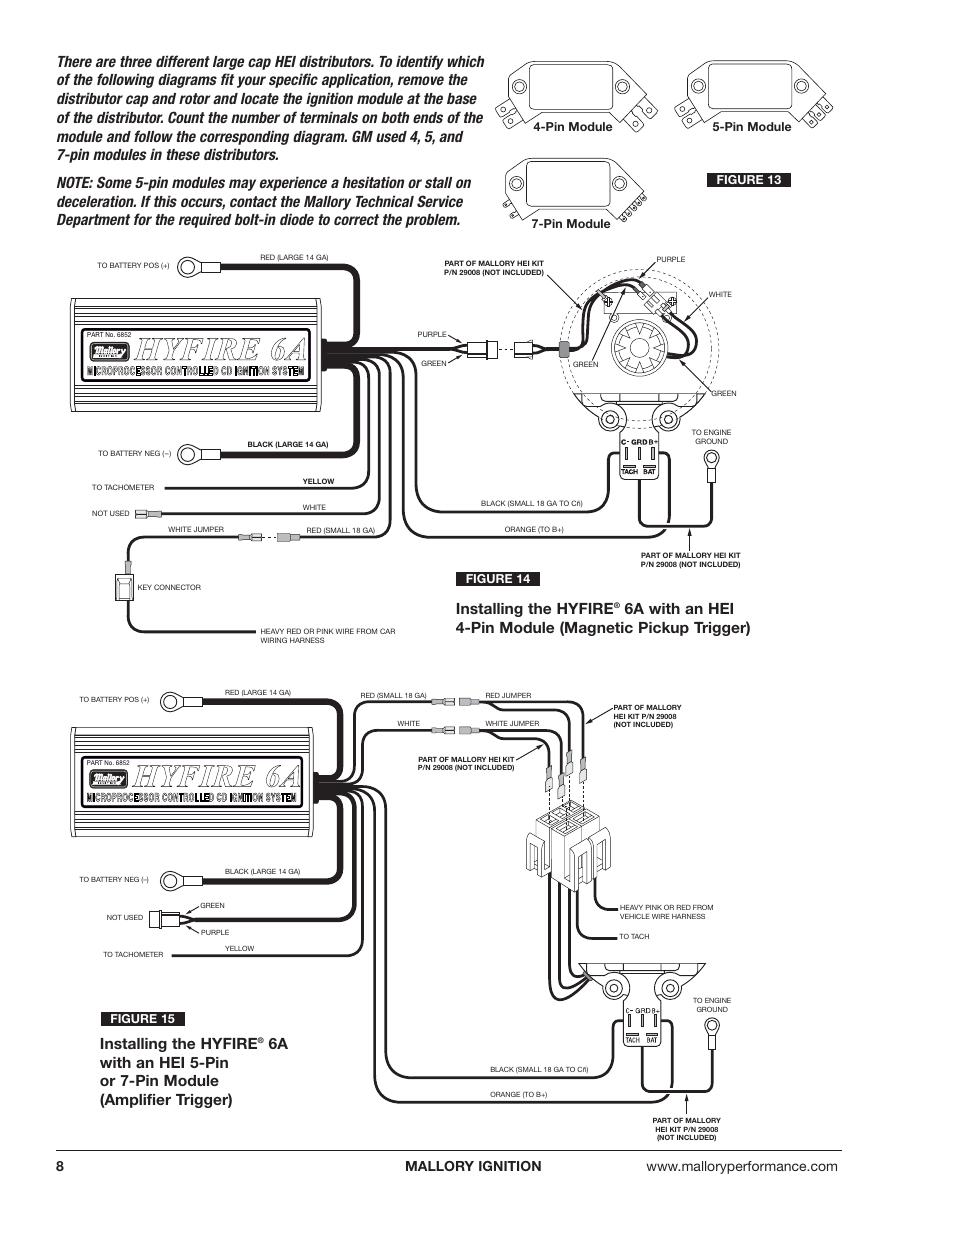 Mallory 6Al Wiring Diagram from diagramweb.net